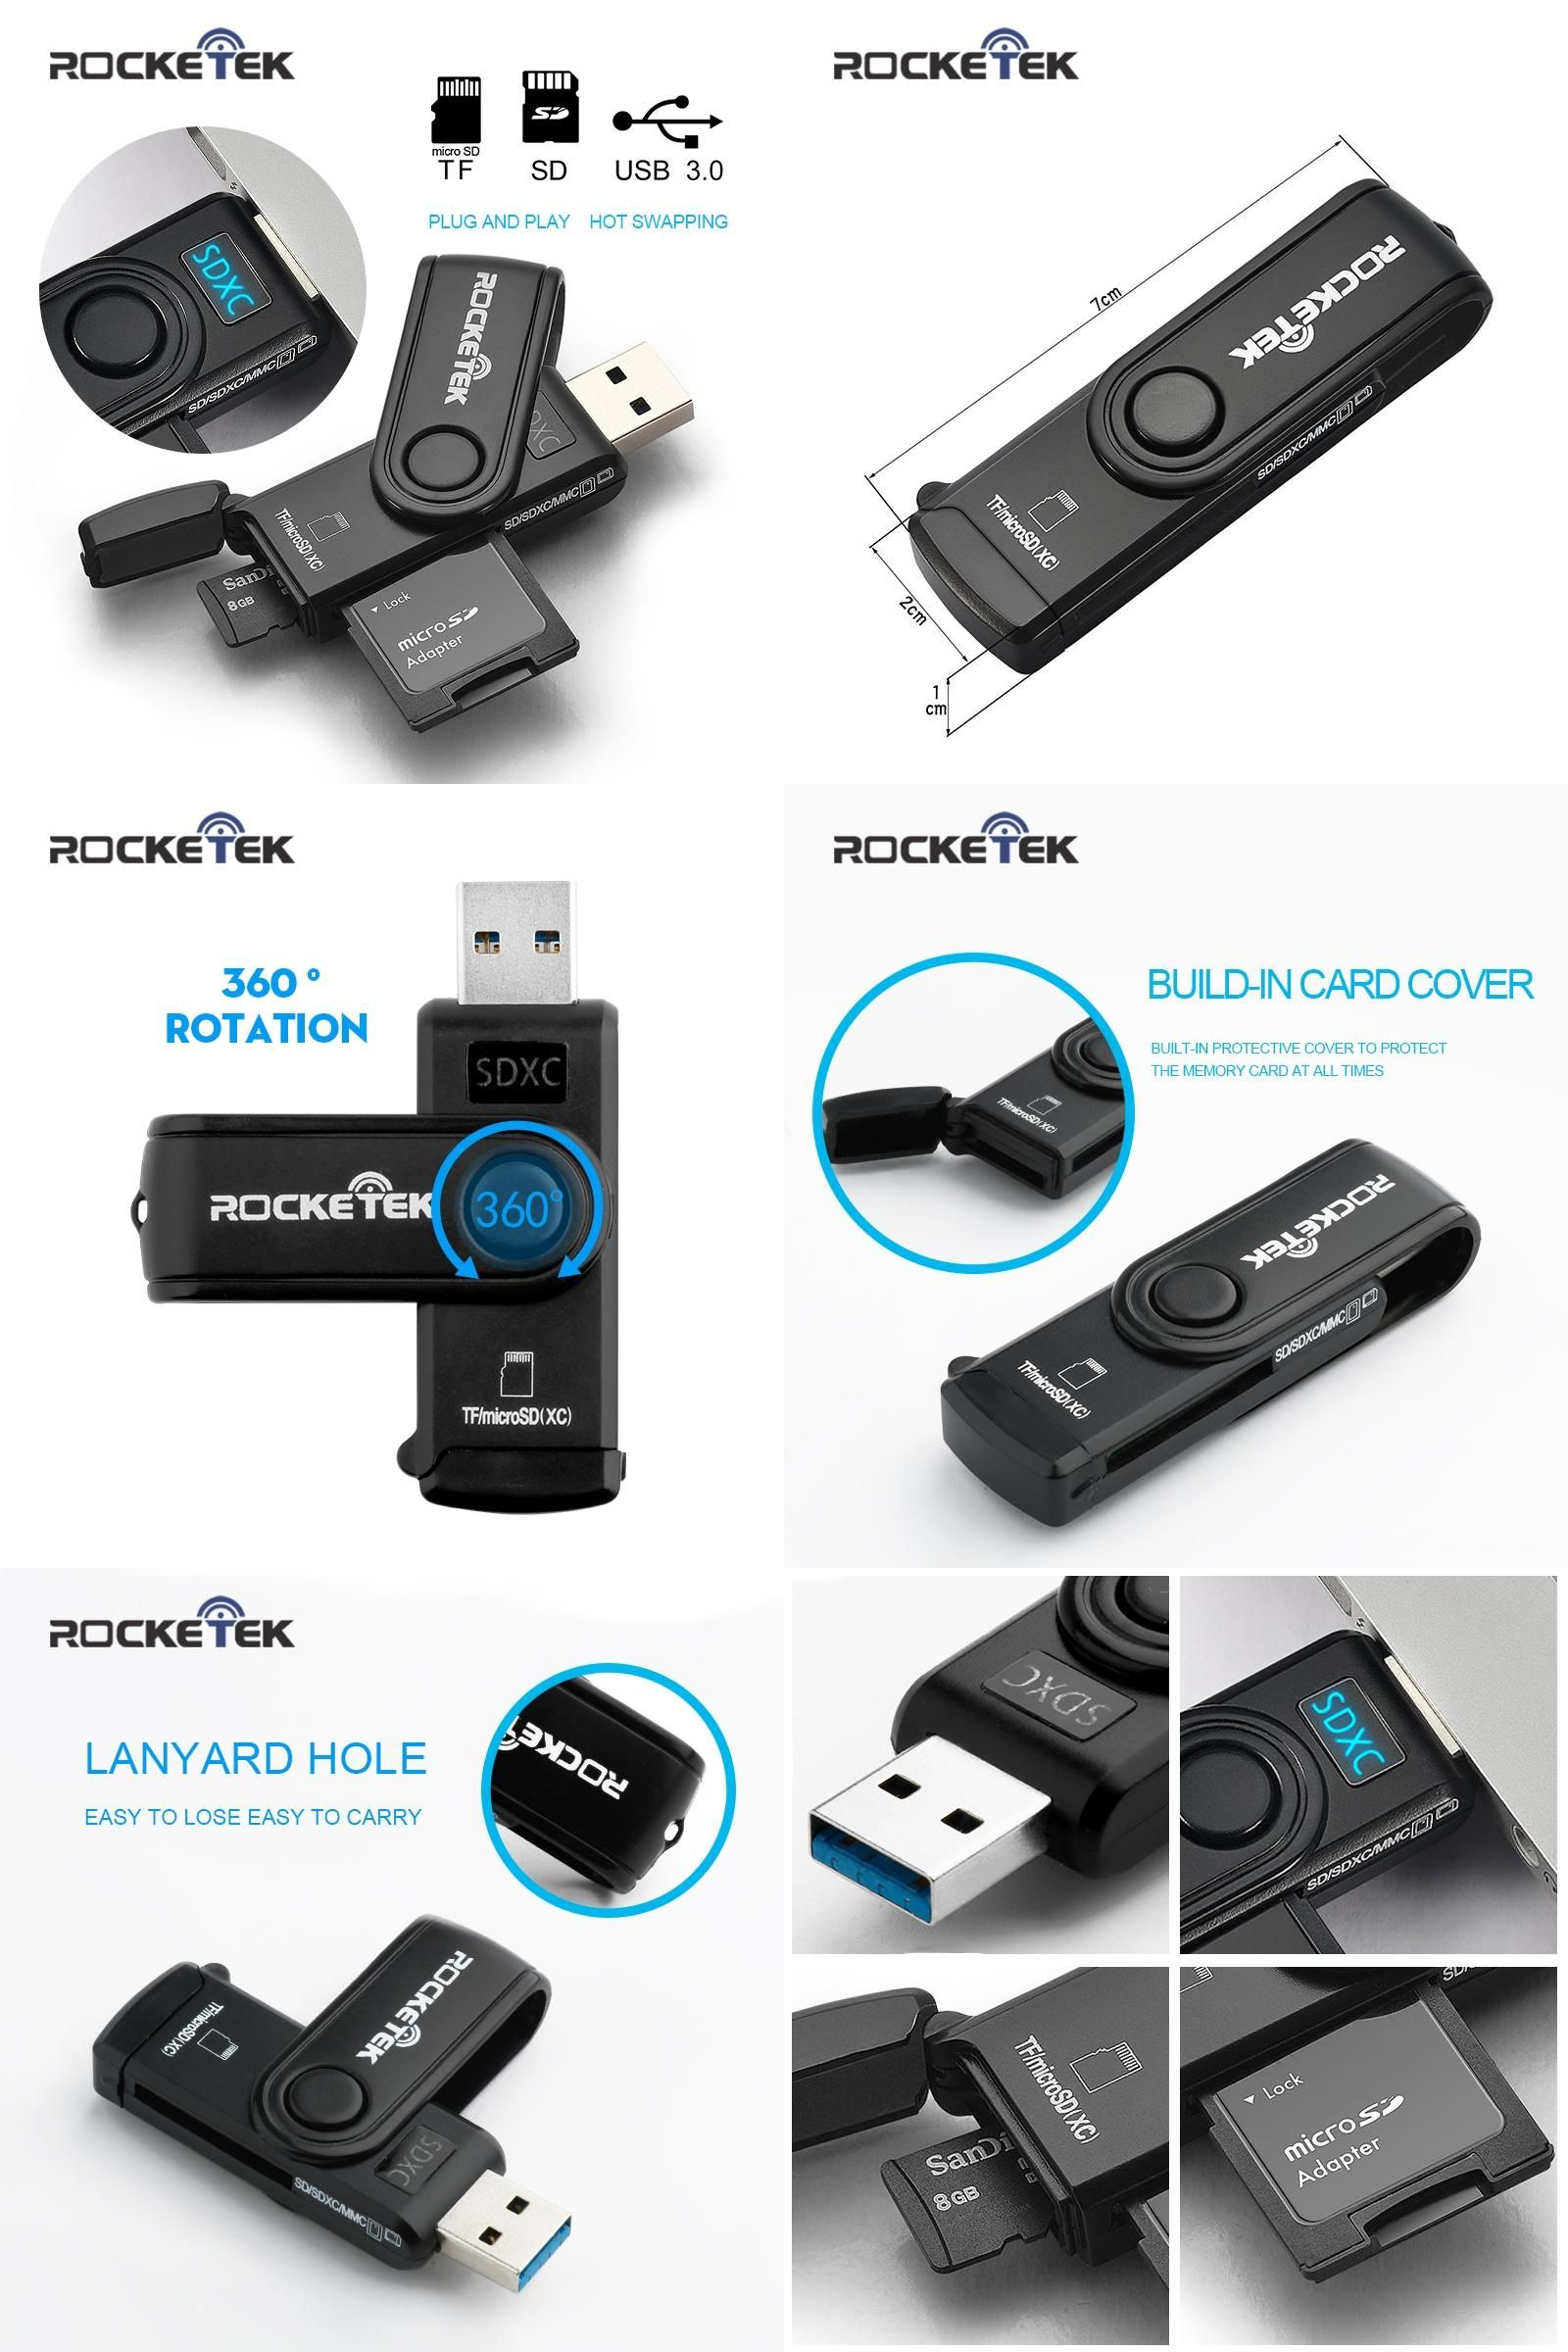 SDHC micro SD SDXC Rocketek USB 3.0 Memory Card Reader and OTG phone card reader 2 Slots Card Reader for SD